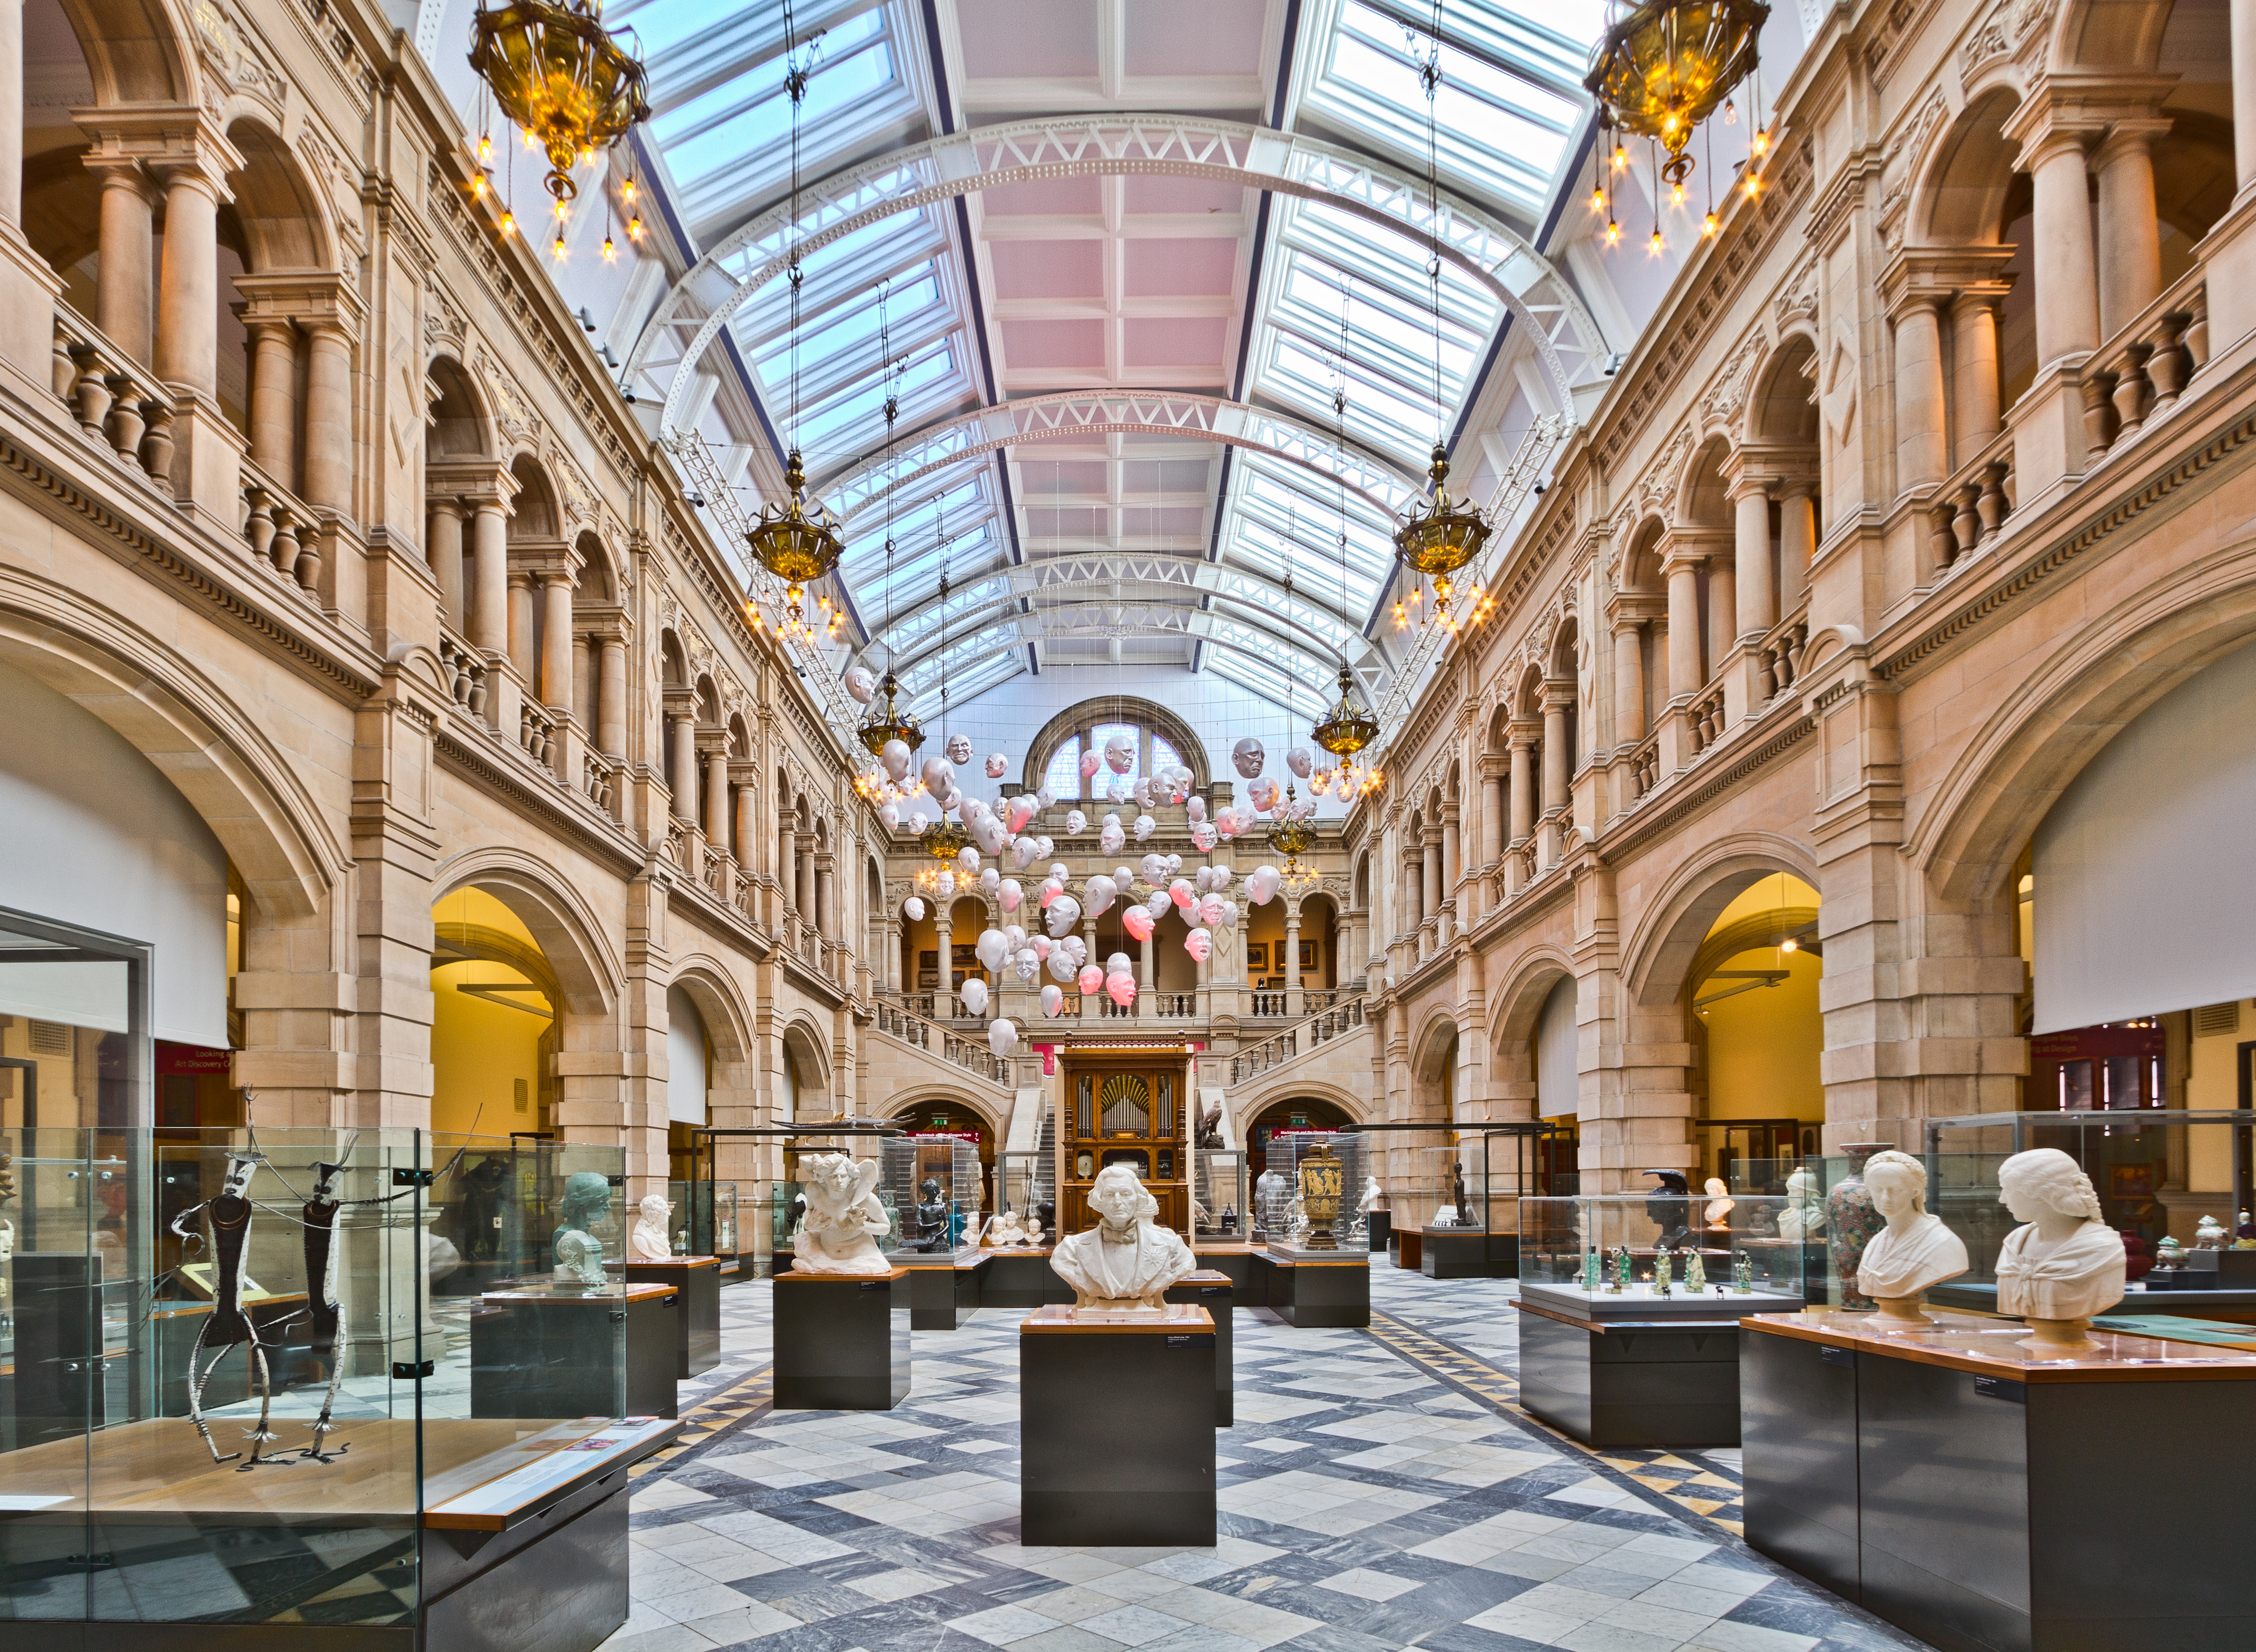 Historia e arteve - Wikipedia on